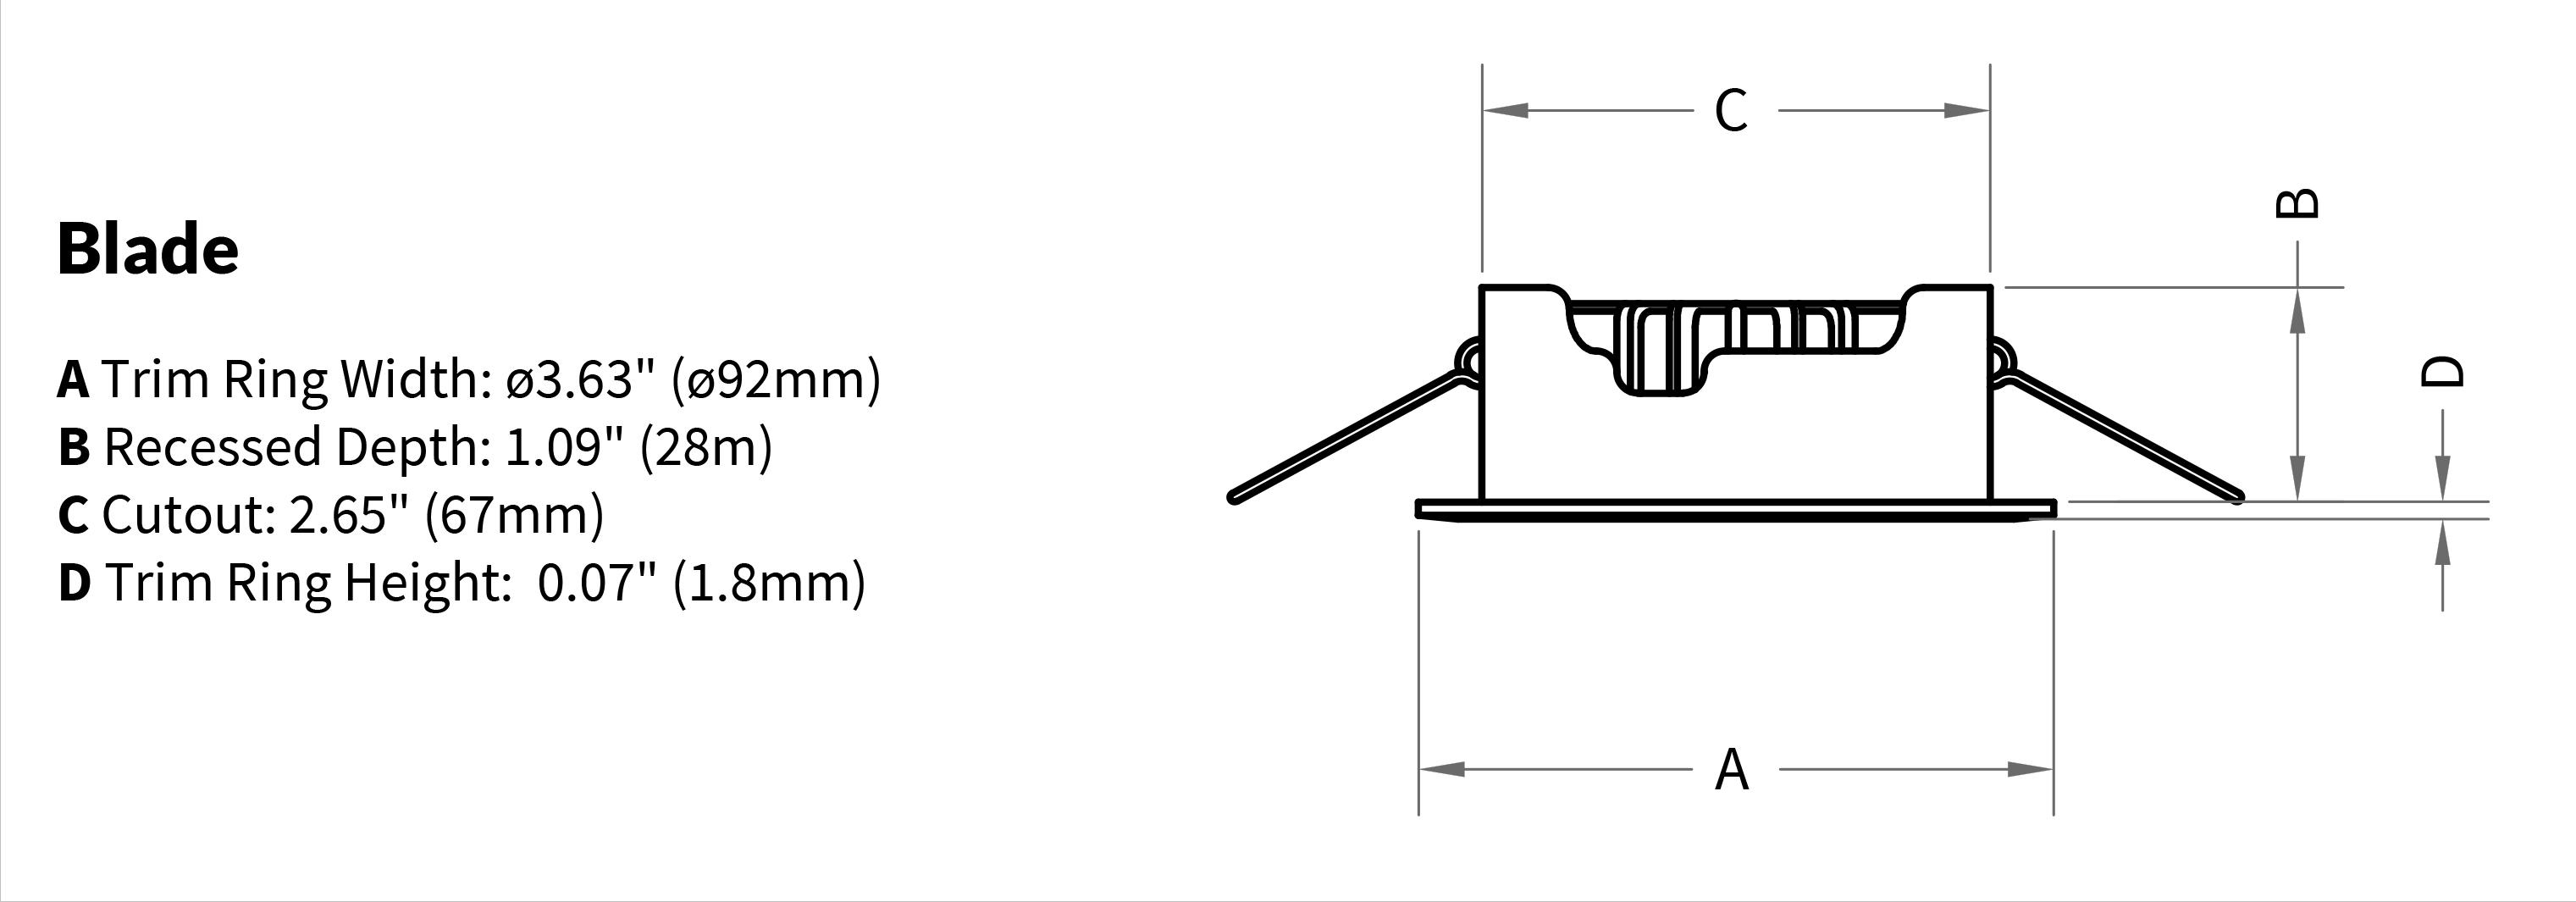 blade-dim-drawing.jpg